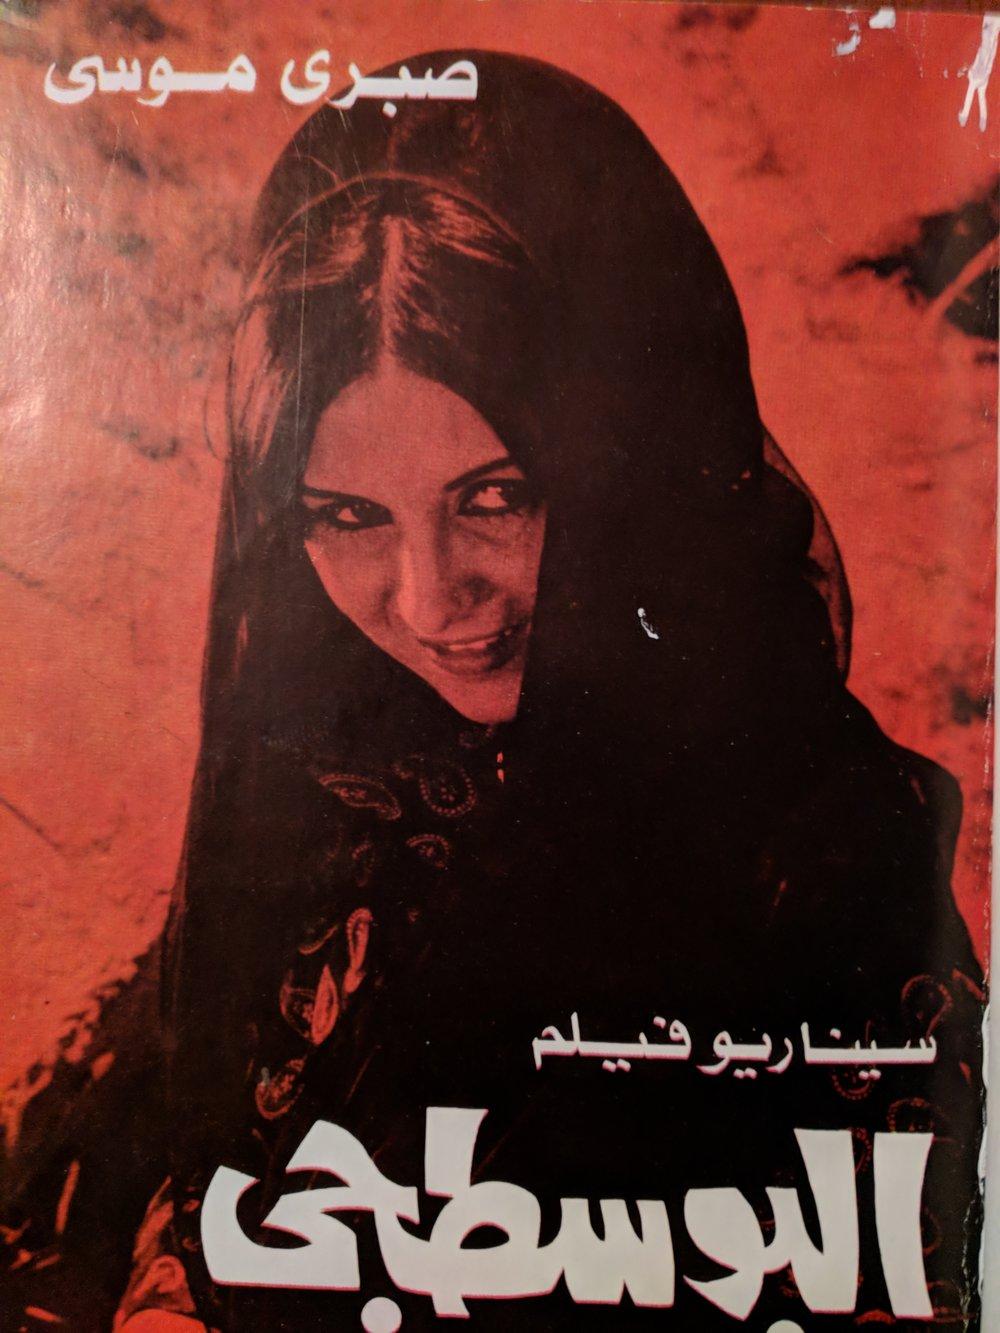 ṢabrīMūsā (al-Qāhirah: Muʾassasat Rūz al-Yūsuf, [1983]). Scenario of the film based on Yaḥyā Ḥaqqī's  Dīmāʾ wa-ṭīn .